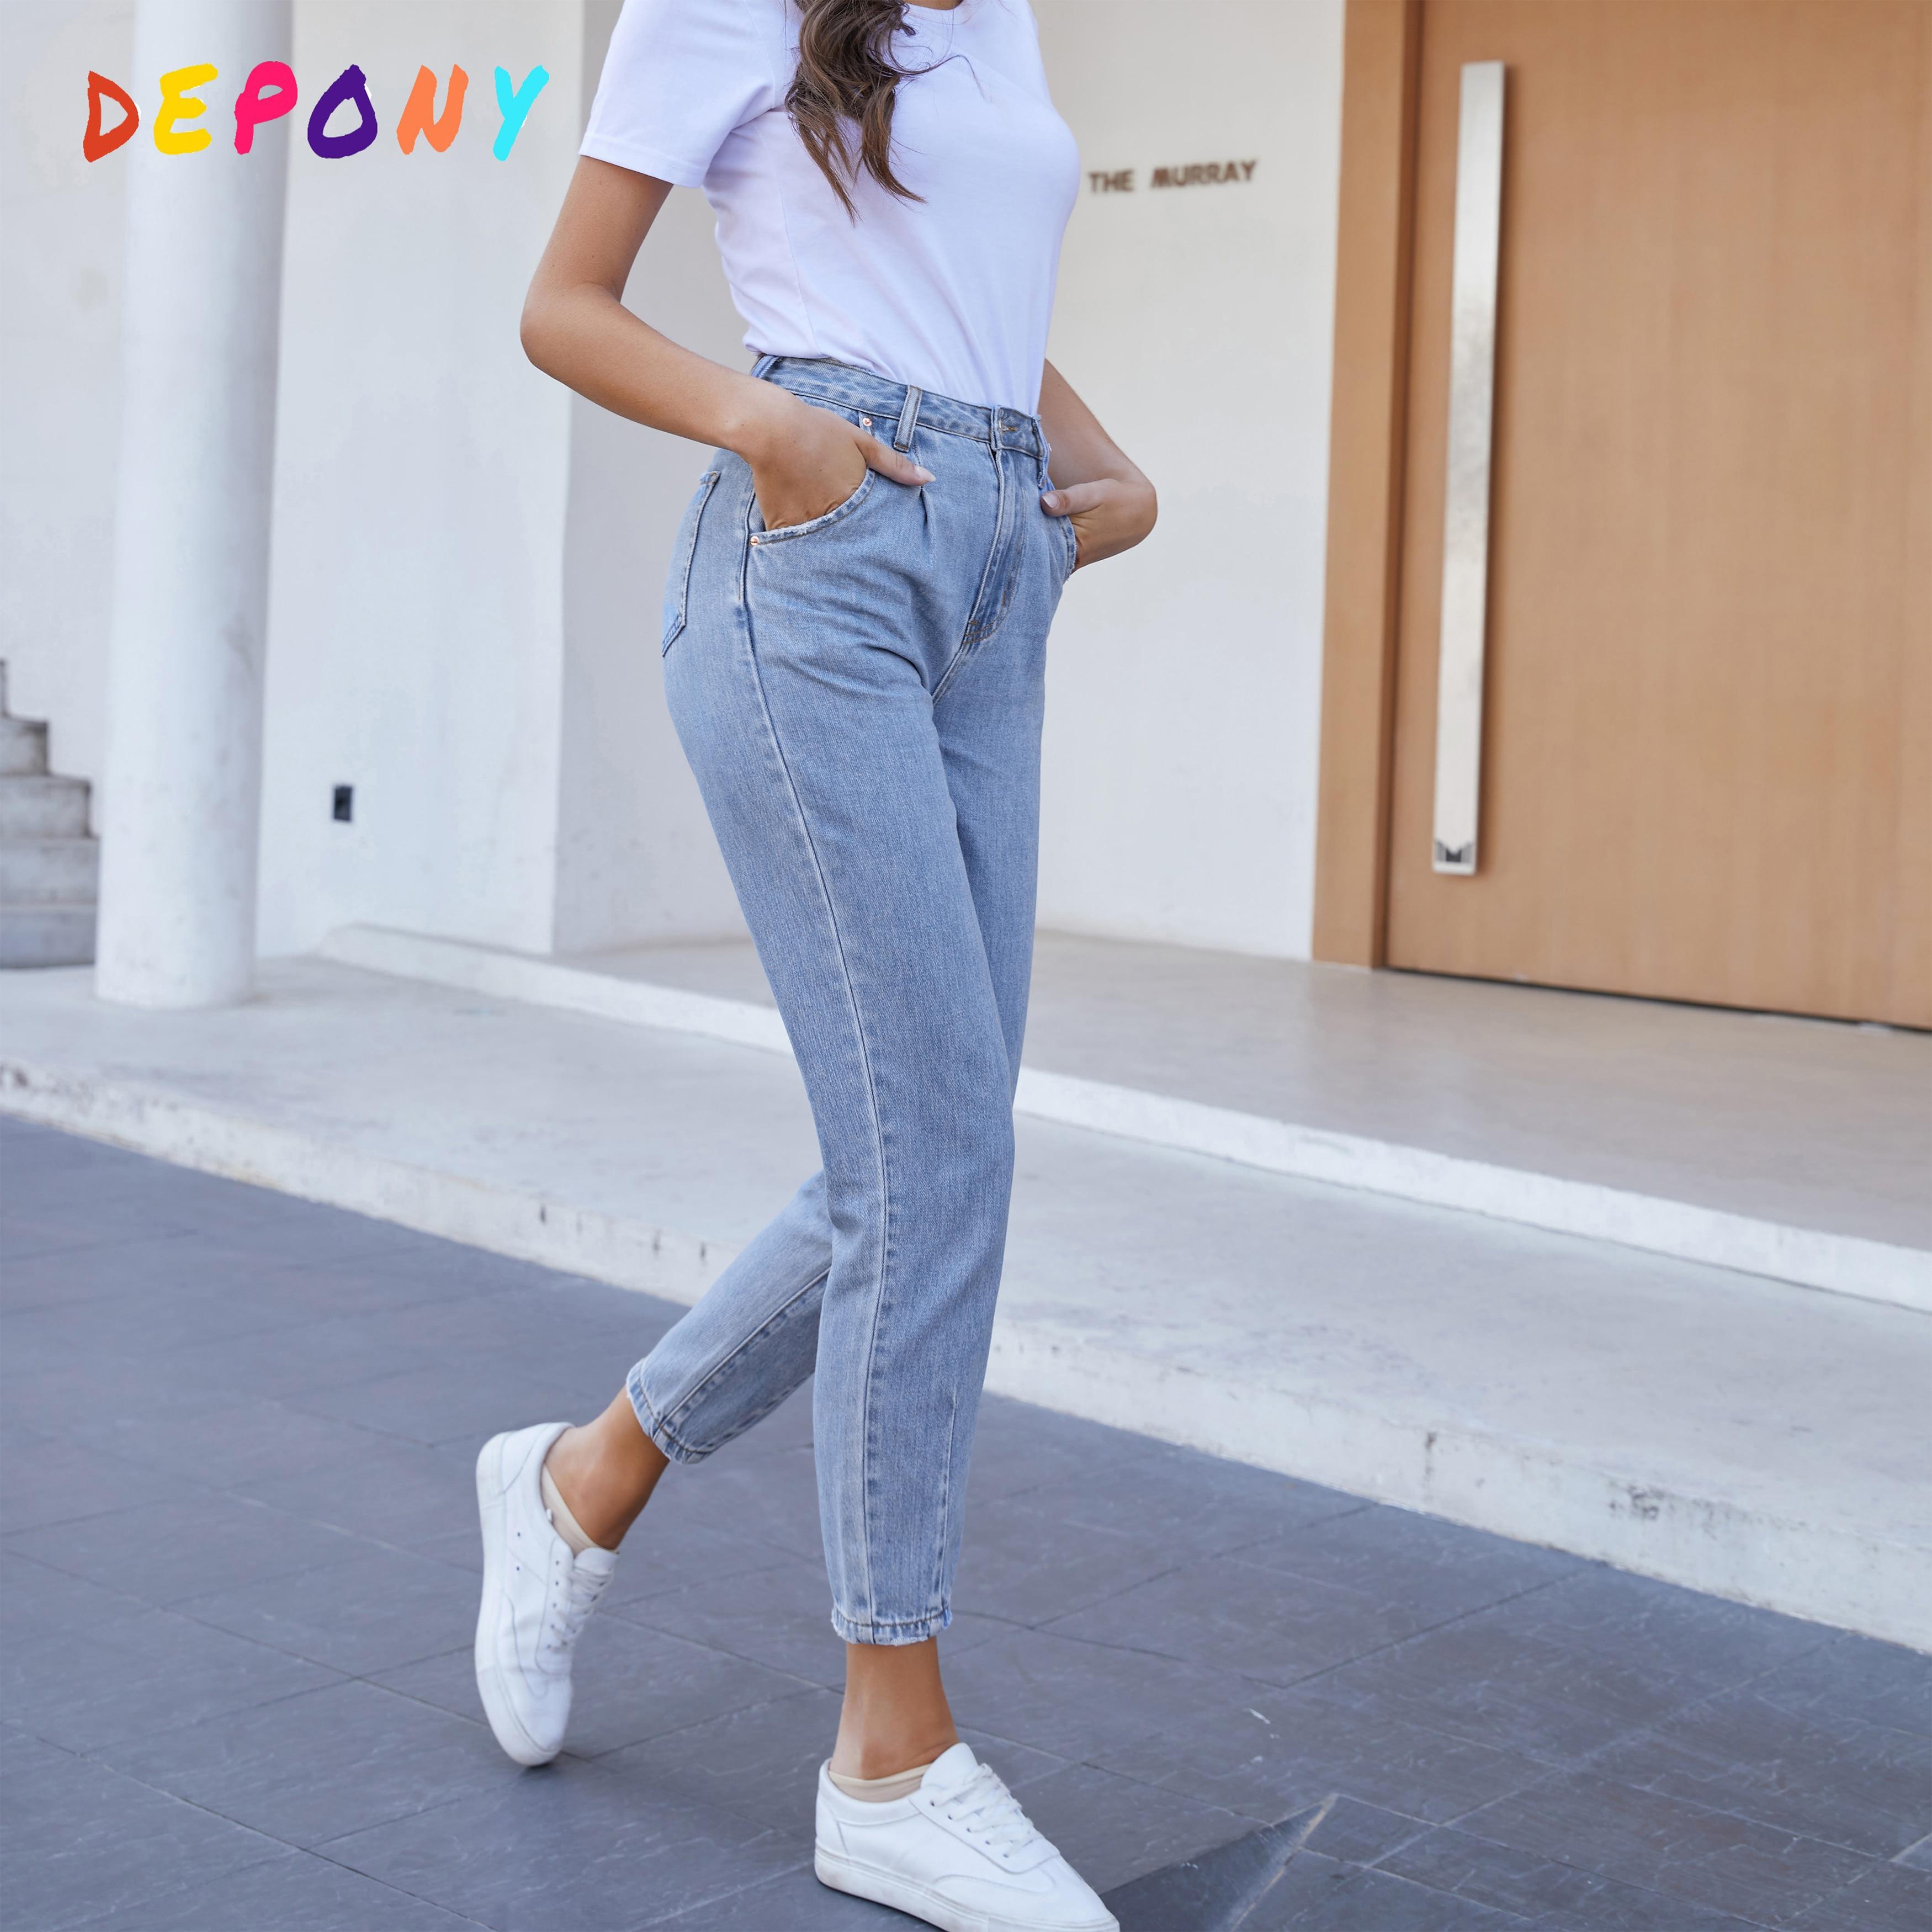 2021 Depony High Waist Mom Jeans Women Boyfriends Straight Jeans Femme 100% Cotton Loose Vintage Den